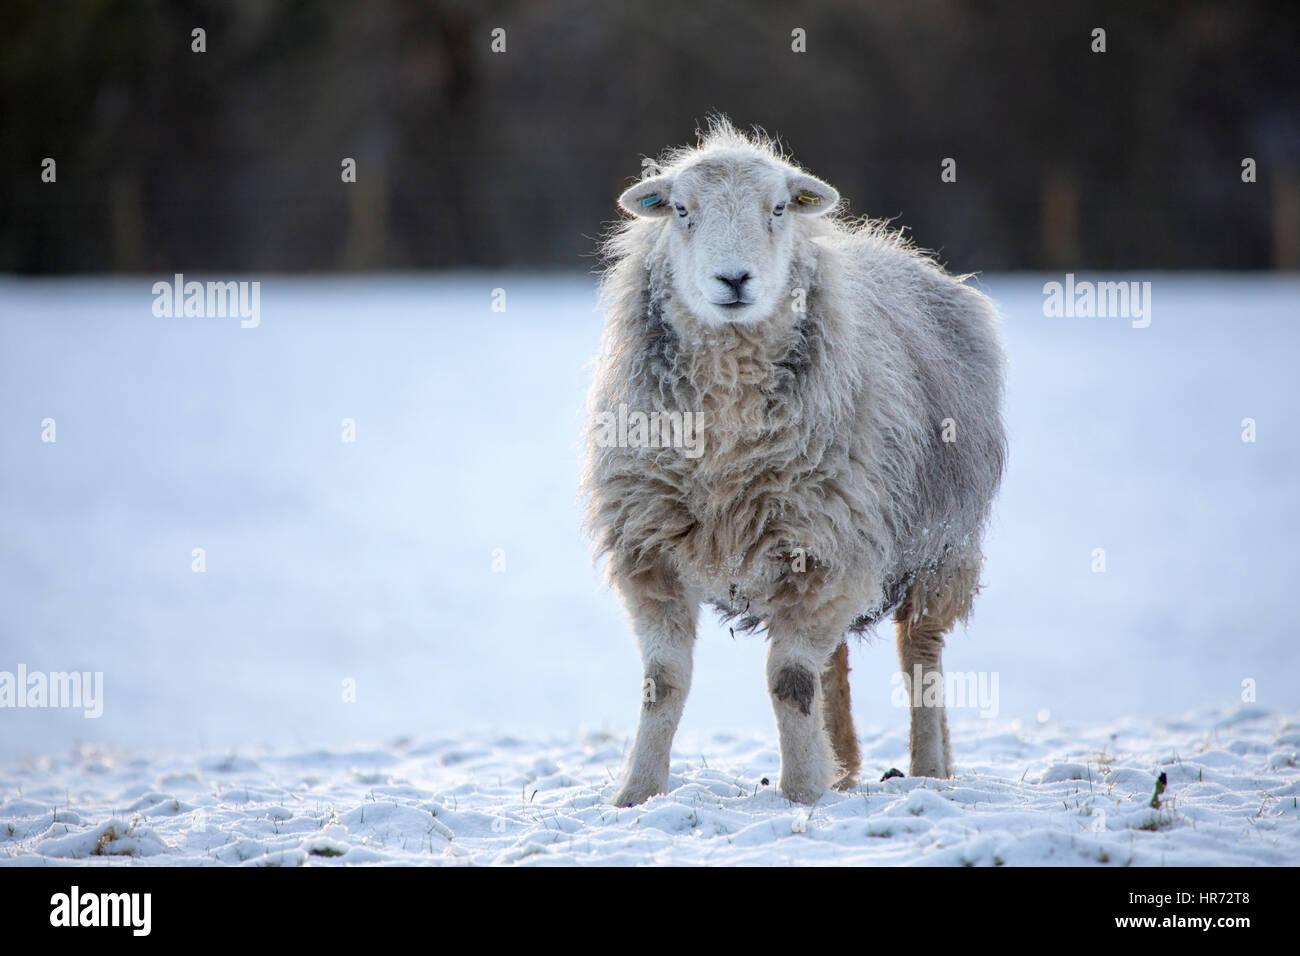 Woolly Herdwick sheep standing in snow in rural Flintshire during a brief spell of snowy weather in Wales, UK - Stock Image